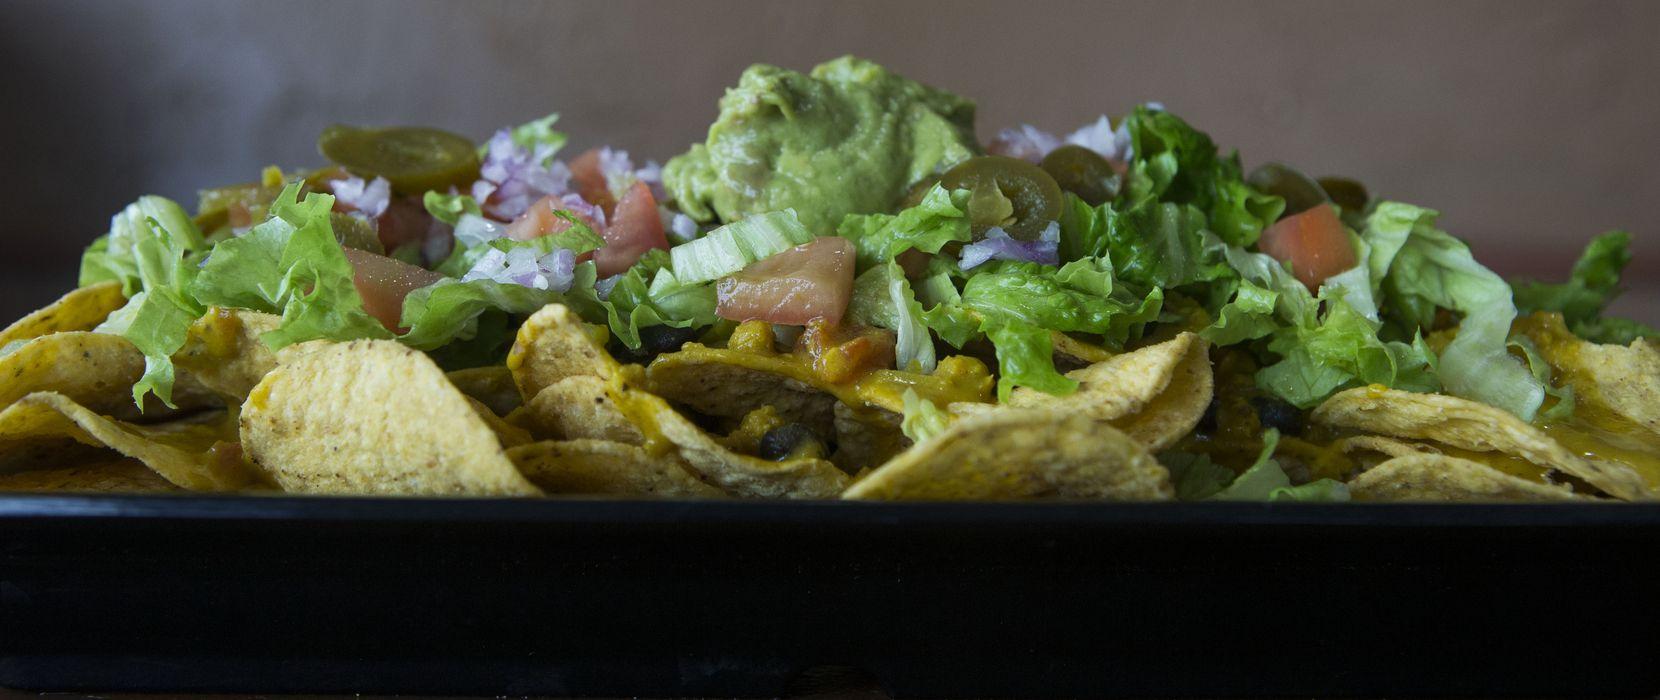 Loaded vegan nachos at Sankofa Kitchen on Friday, July 7, 2017.(Ryan Michalesko/The Dallas Morning News)